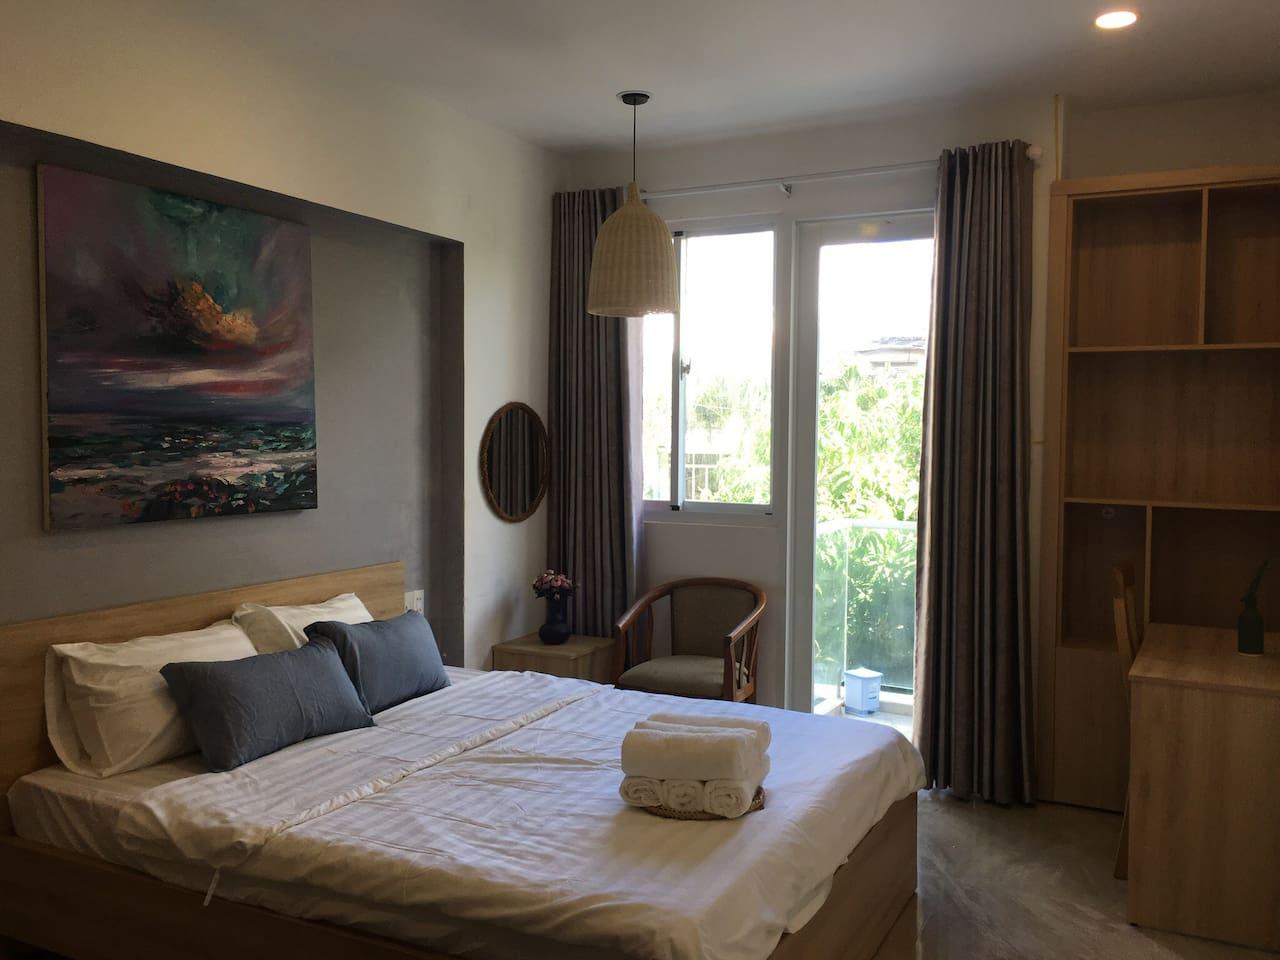 Big bedroom with balcony